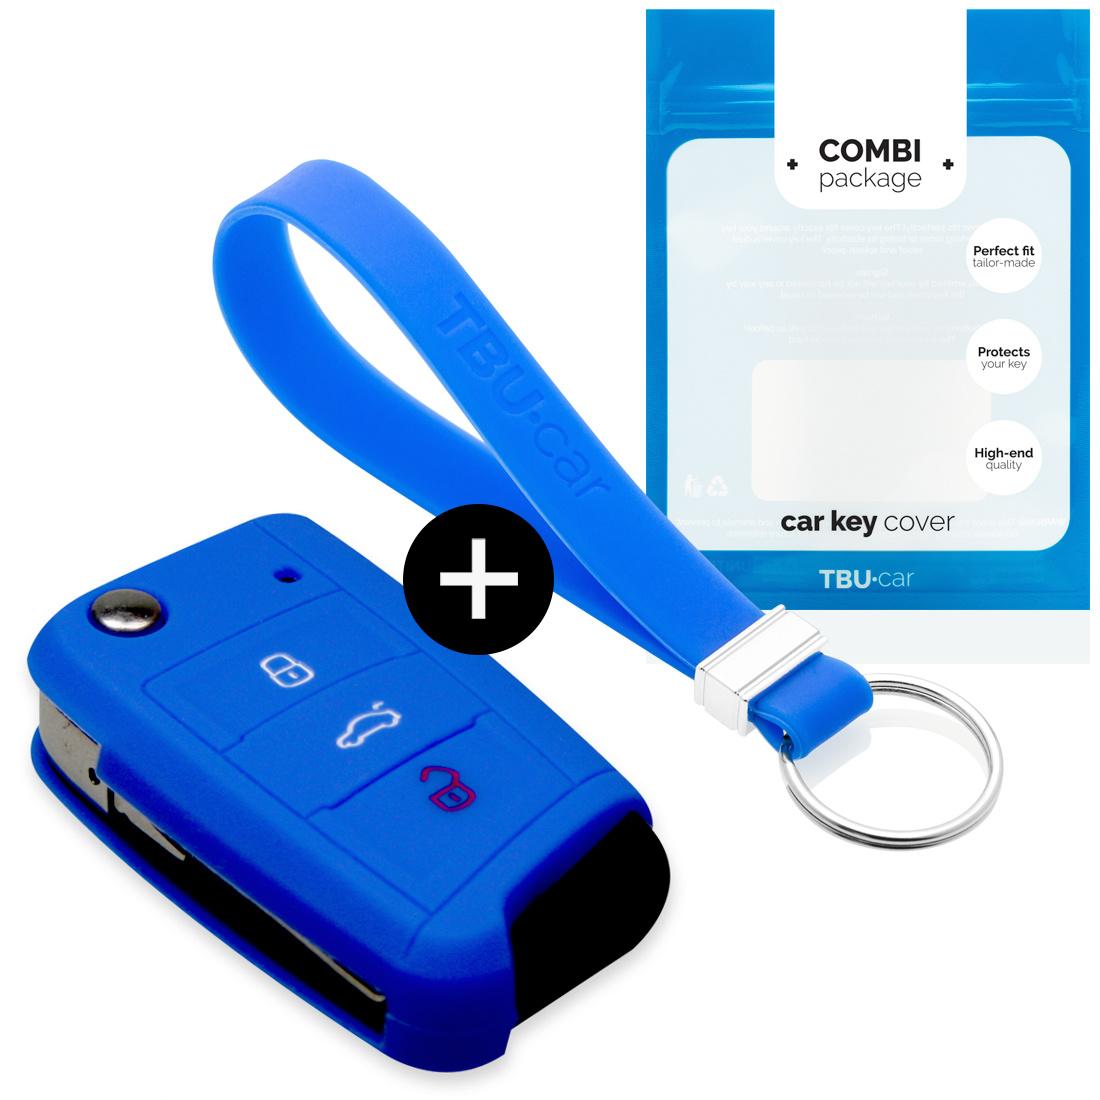 Seat Autoschlüssel Hülle - Silikon Schutzhülle - Schlüsselhülle Cover - Blau